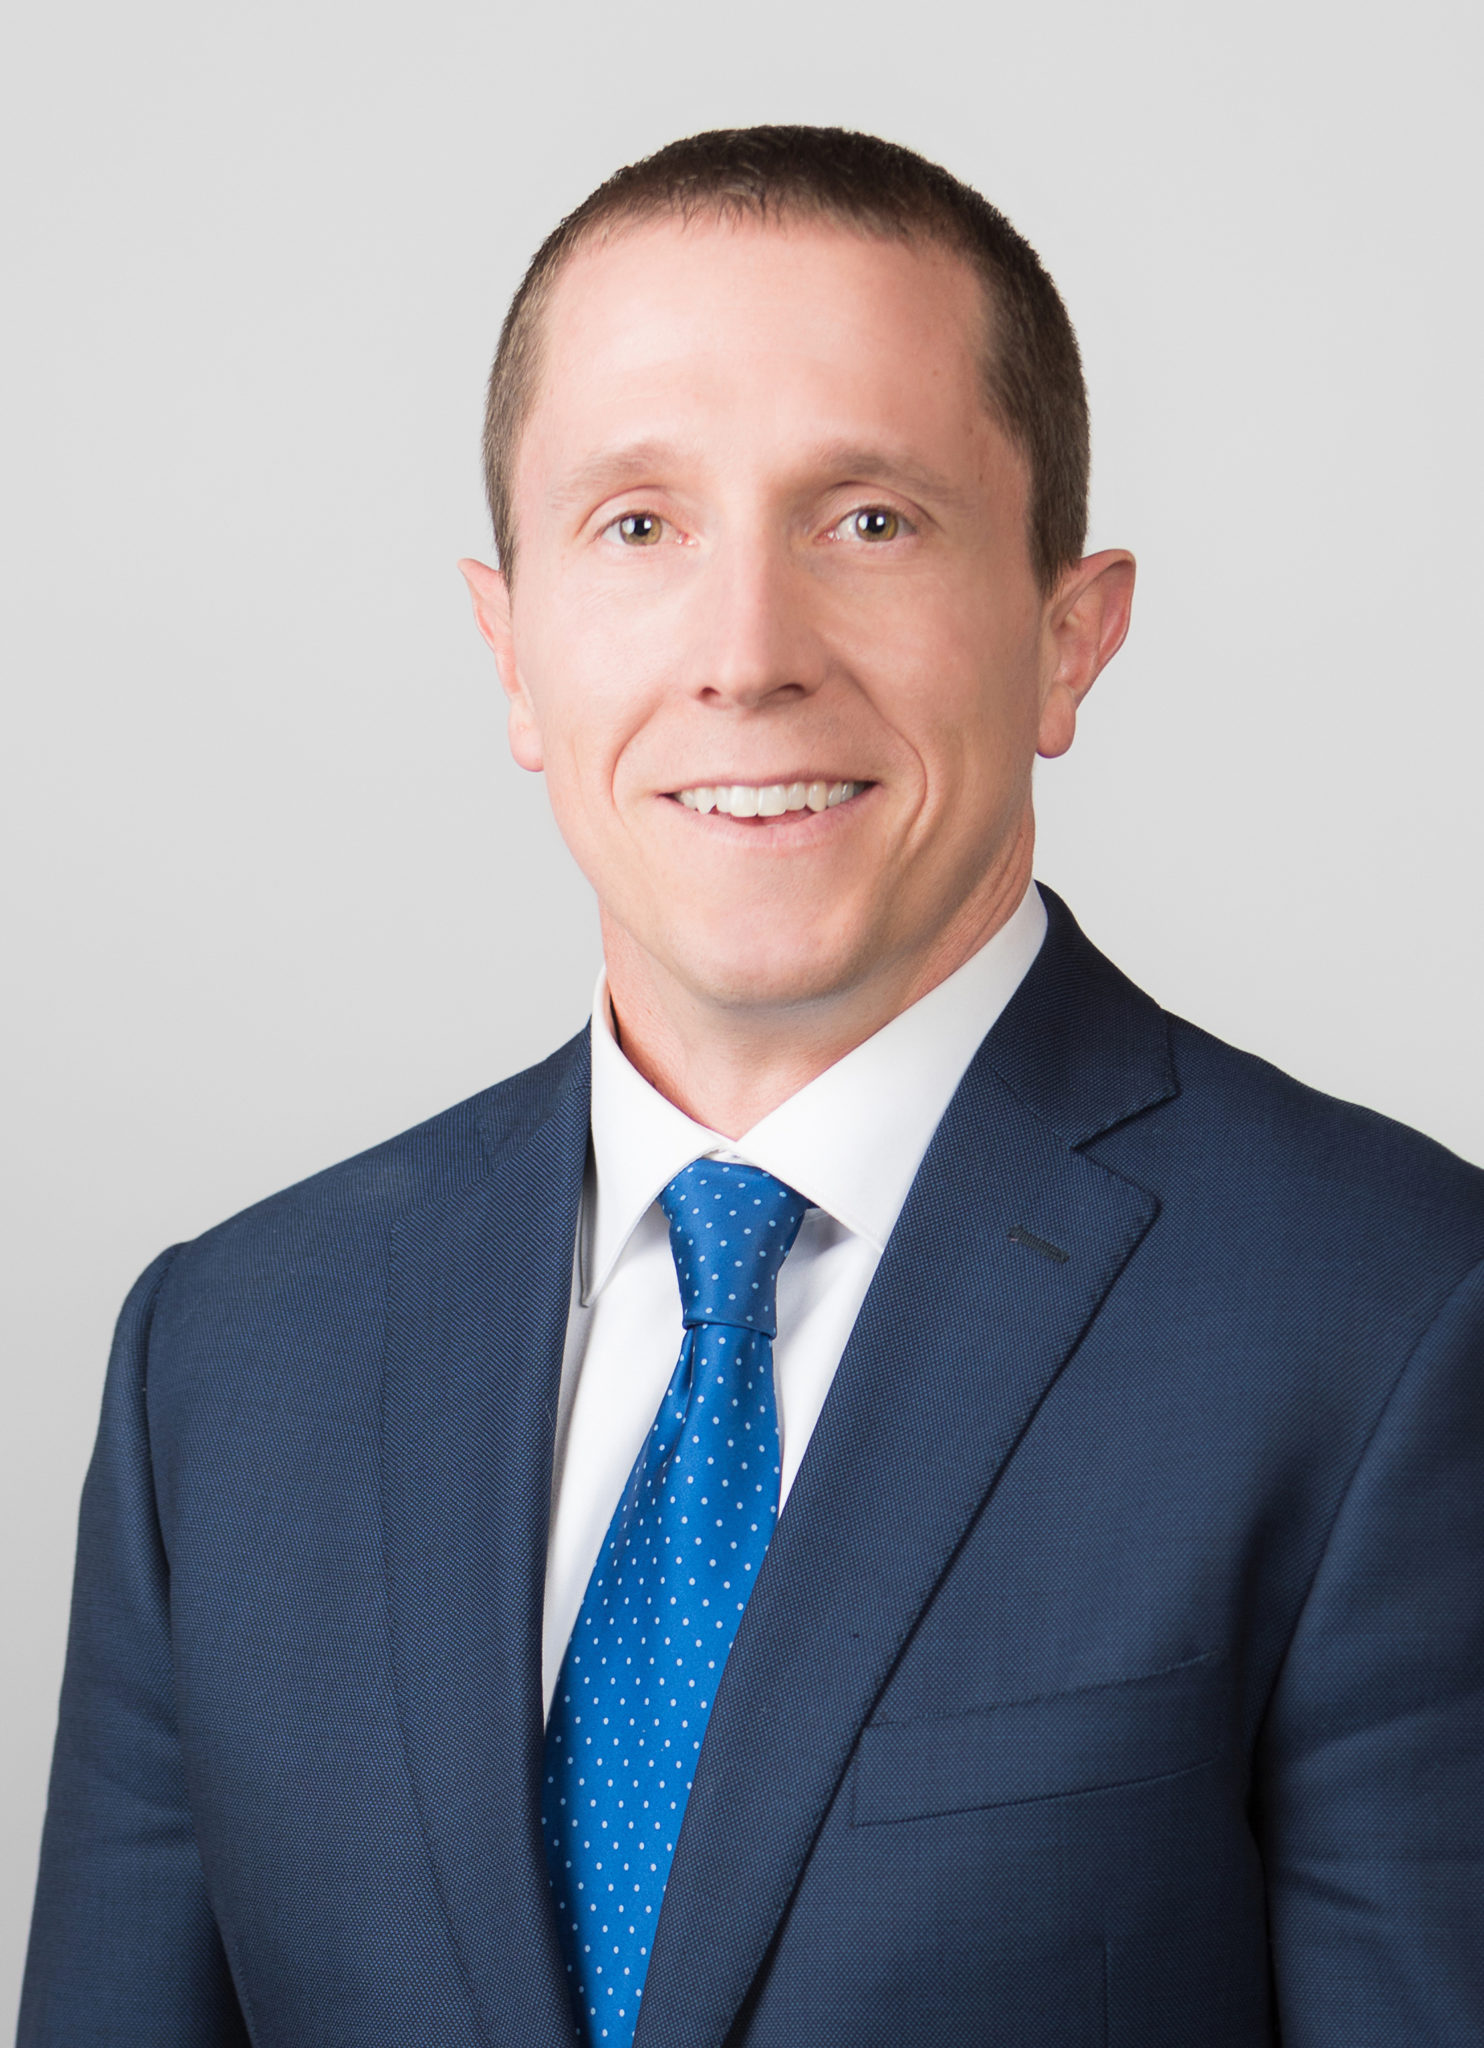 Ryan Spellerberg, First Premier Bank